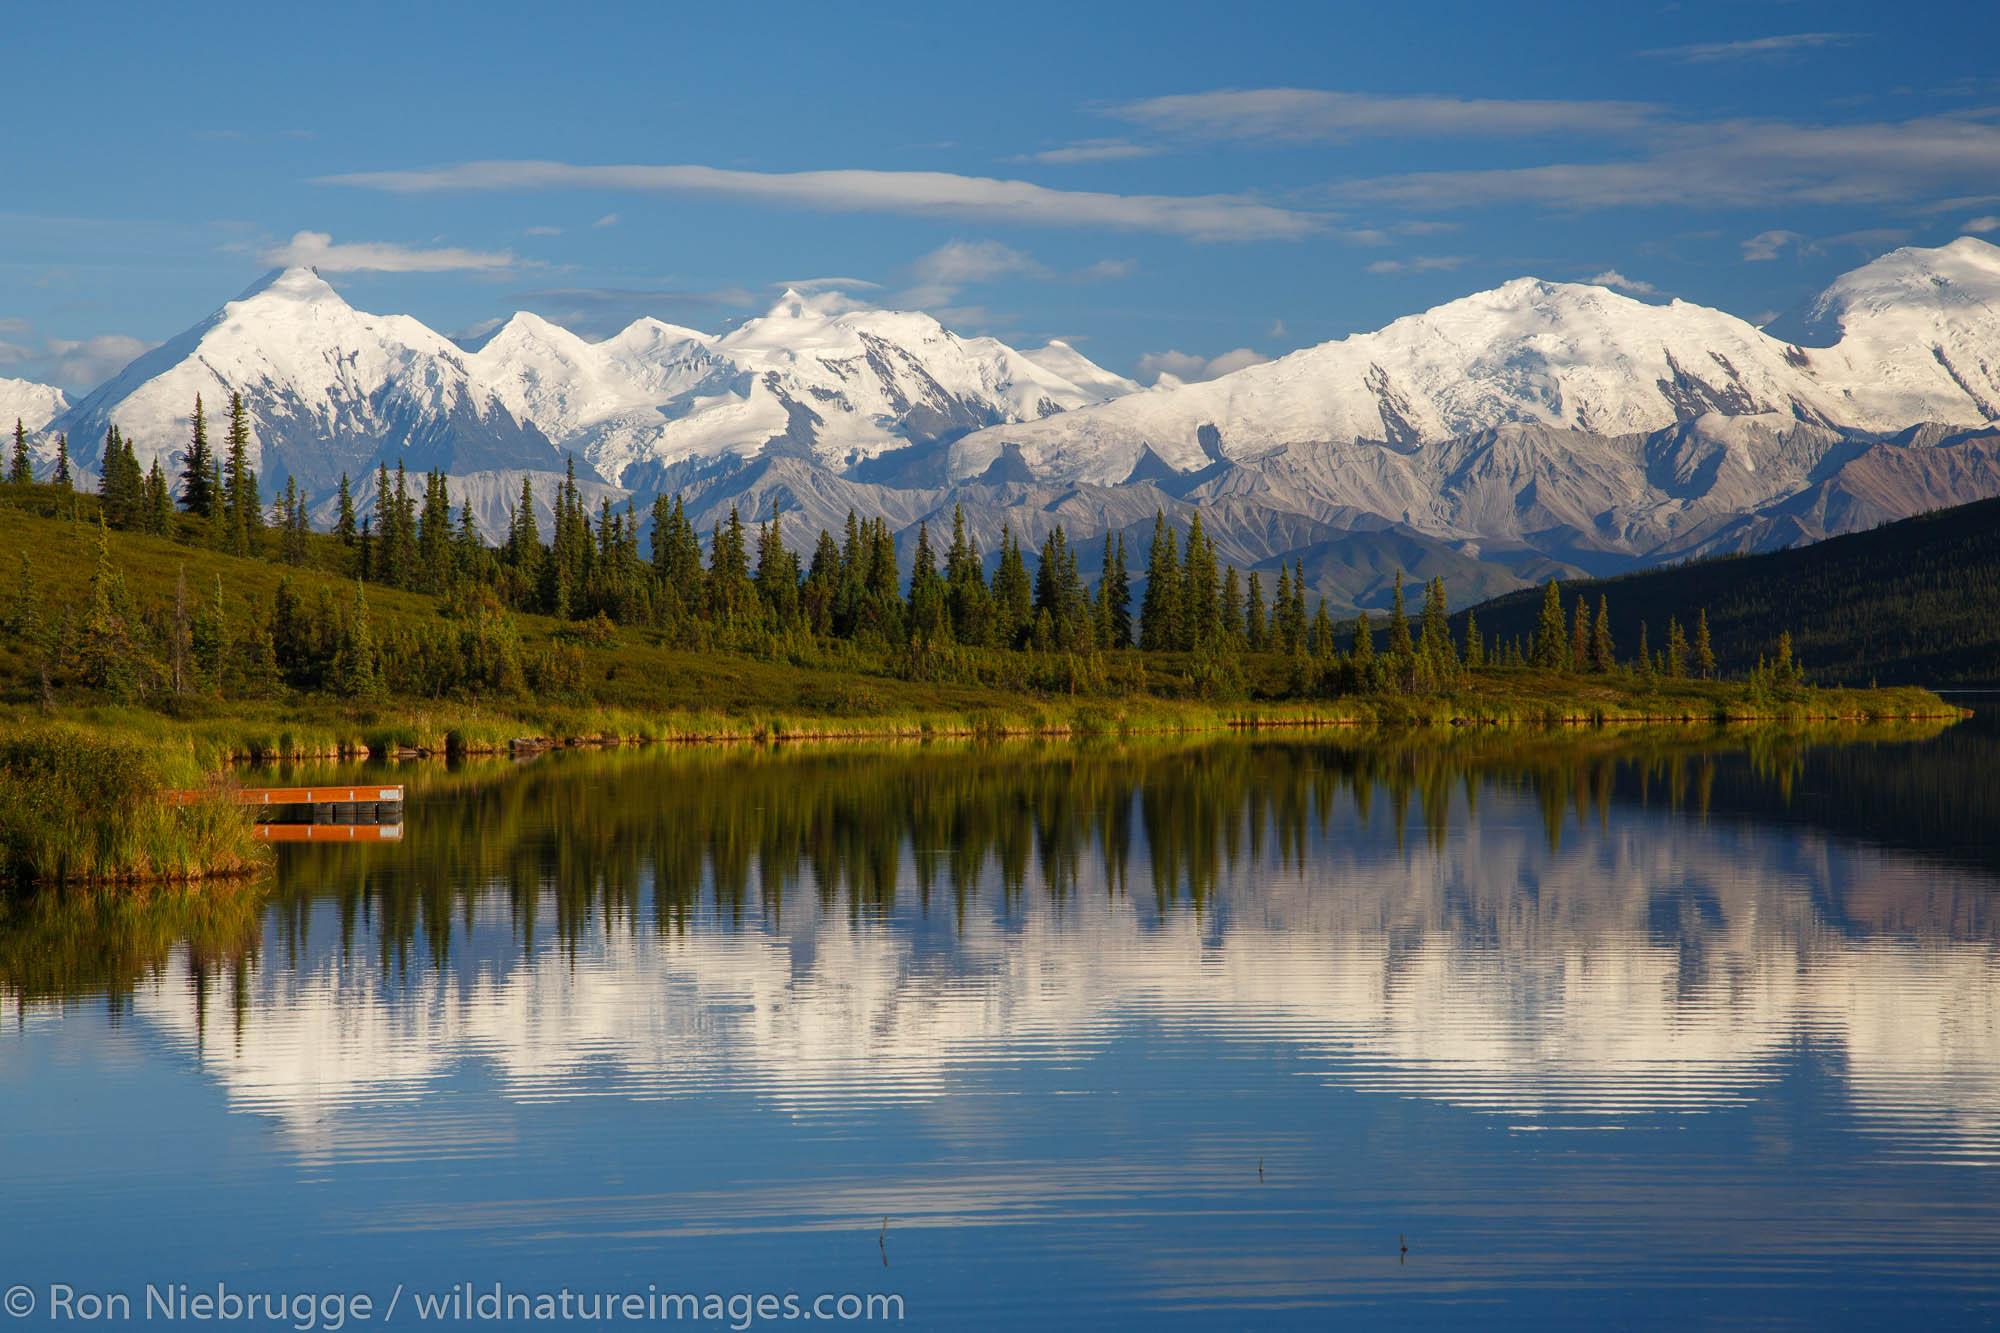 Mt McKinley, also known as Denali, from Wonder Lake, Denali National Park, Alaska.